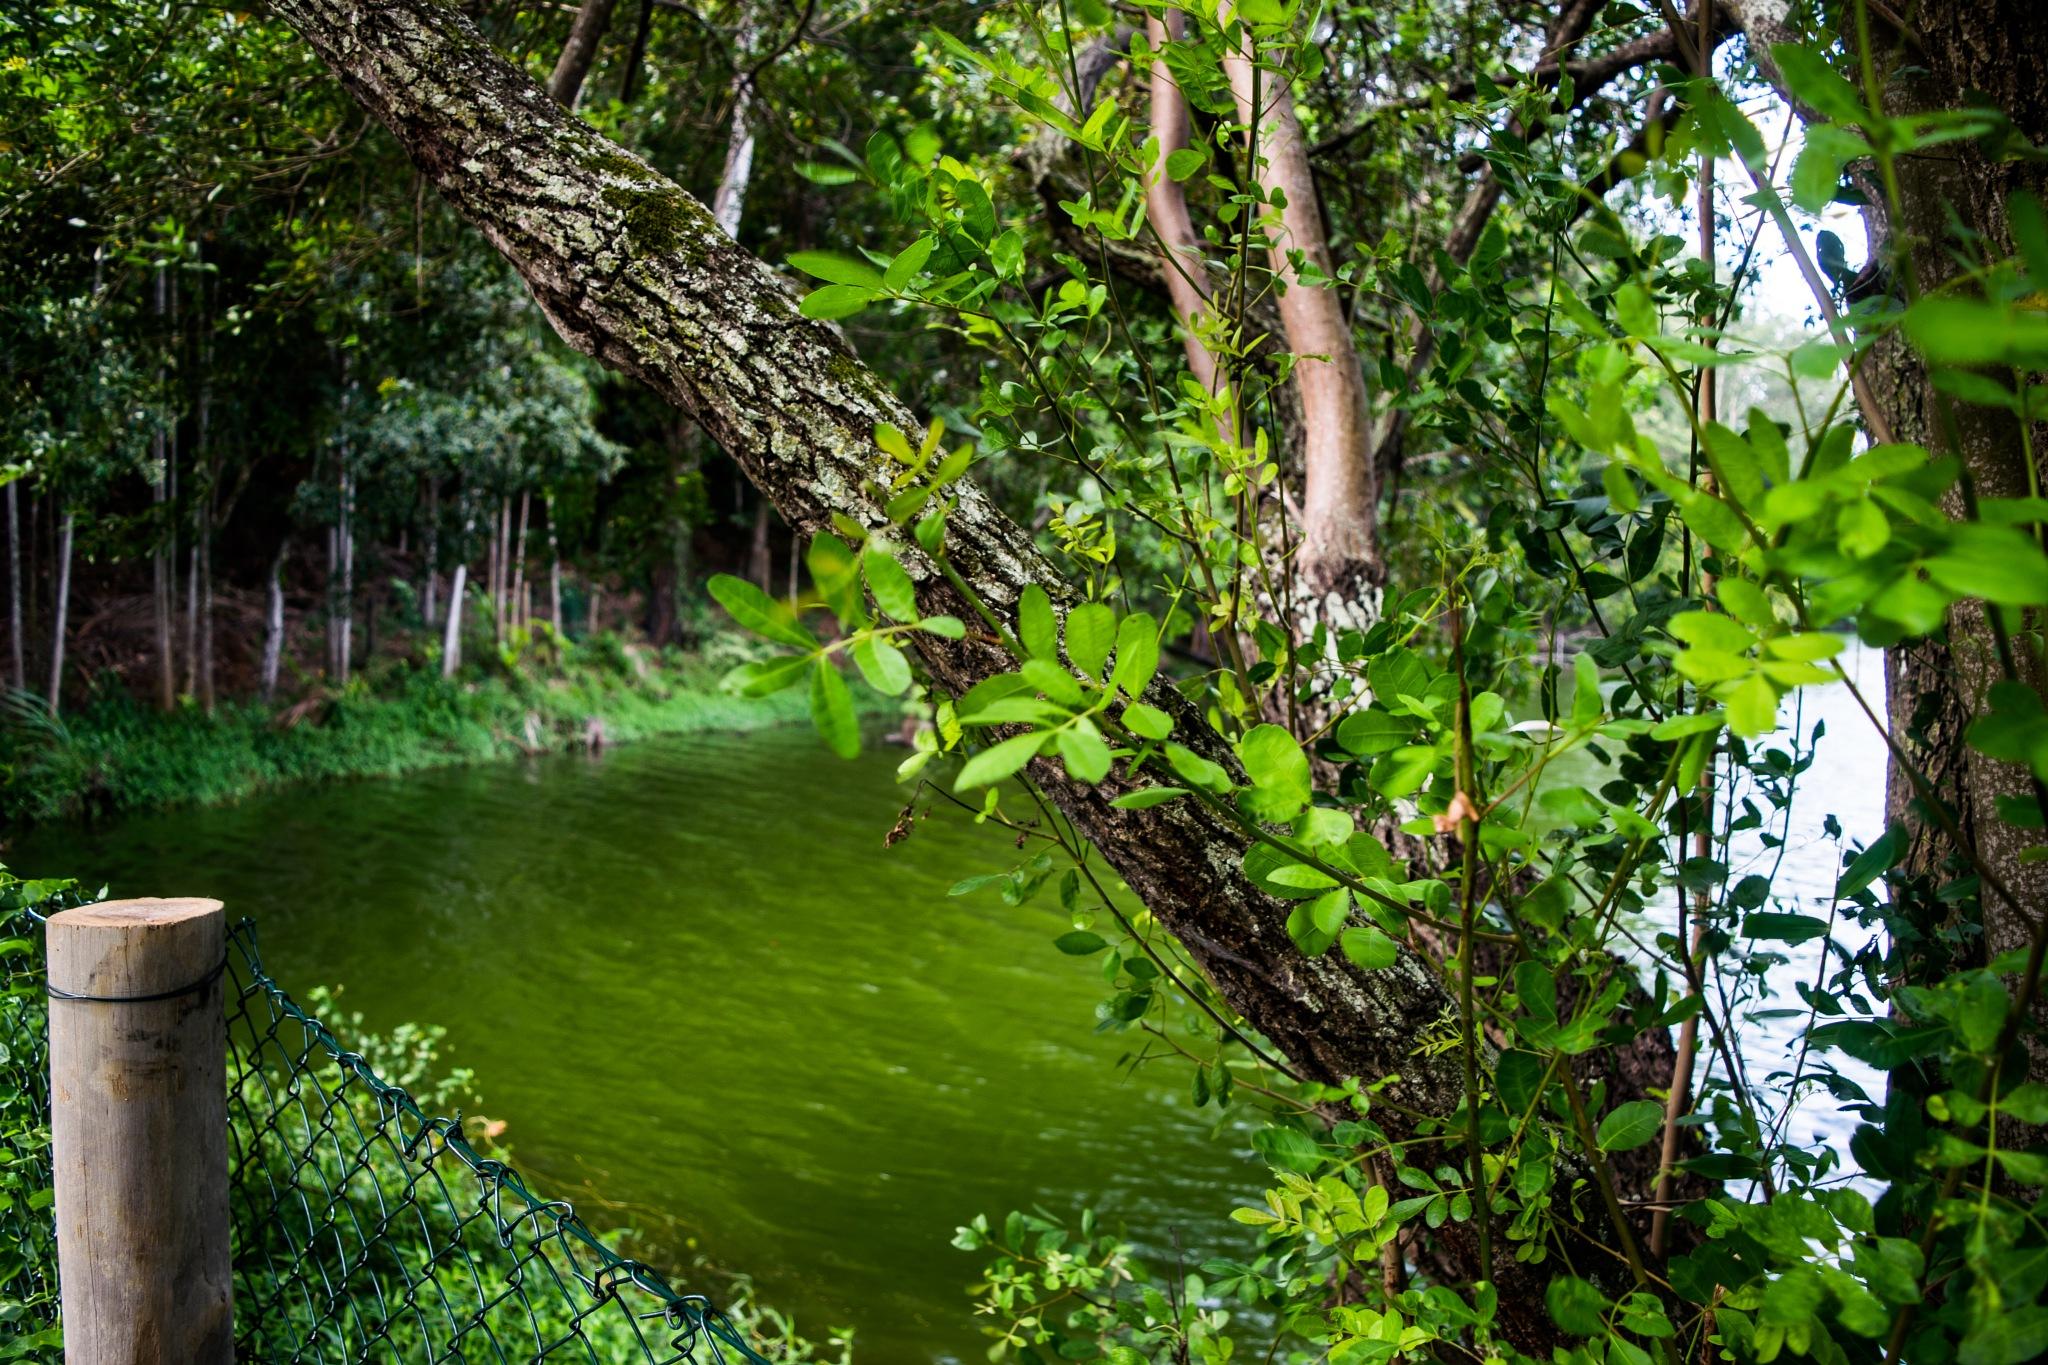 Lagoa Parque Botânico da Vale by Leandro Moura